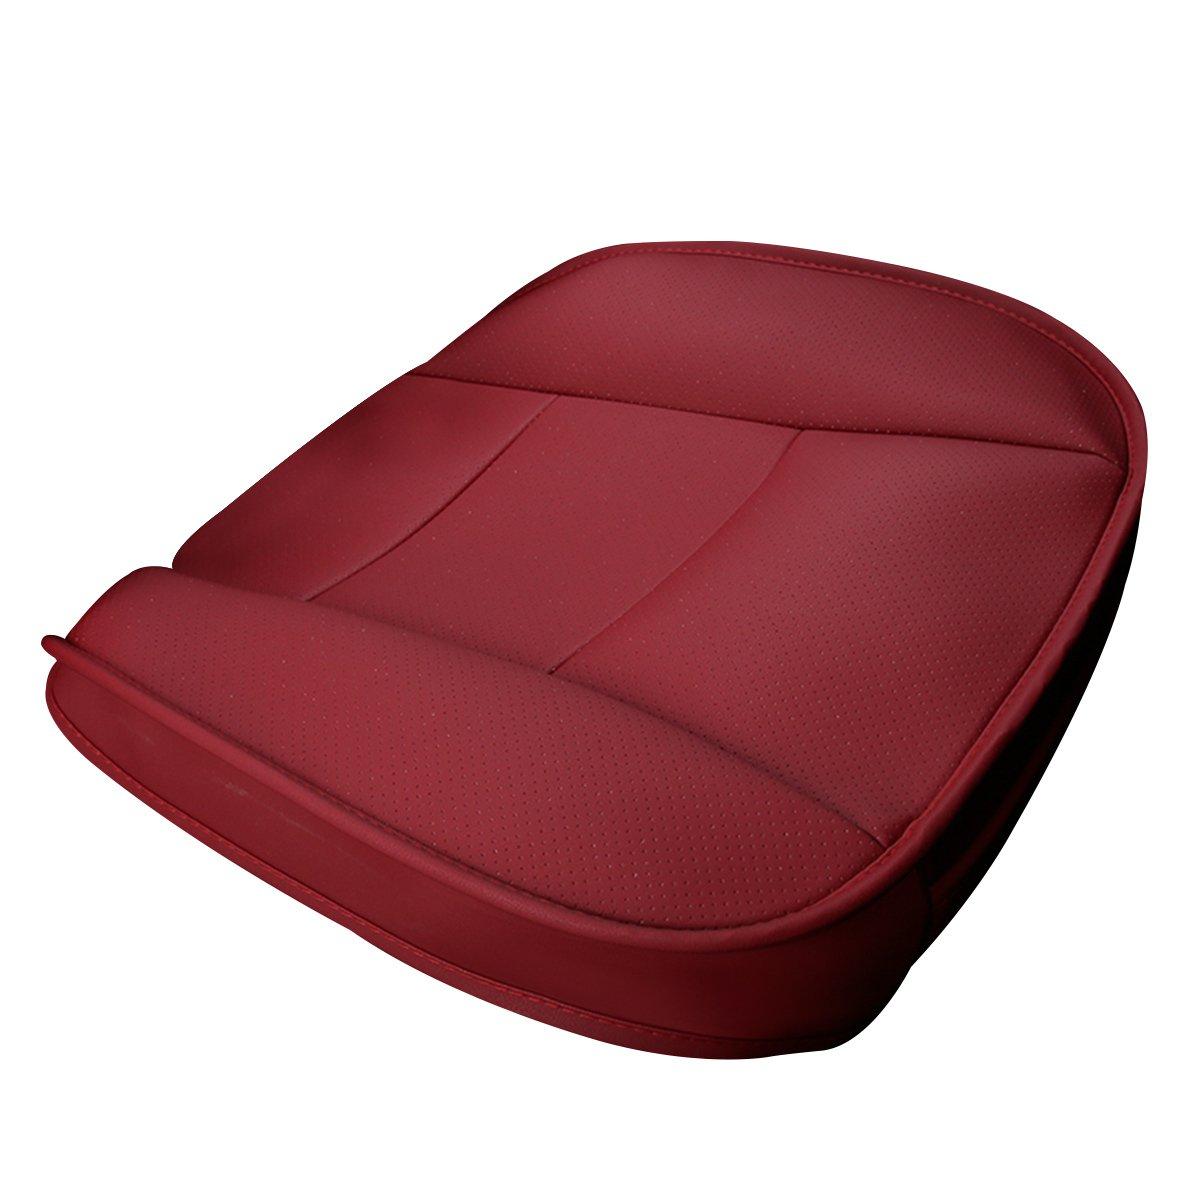 Negro cuero de la PU transpirable C/ómodo antideslizante Health Car Seat Coj/ín para Four Seasons Universal SENSUES Car Seat Cover